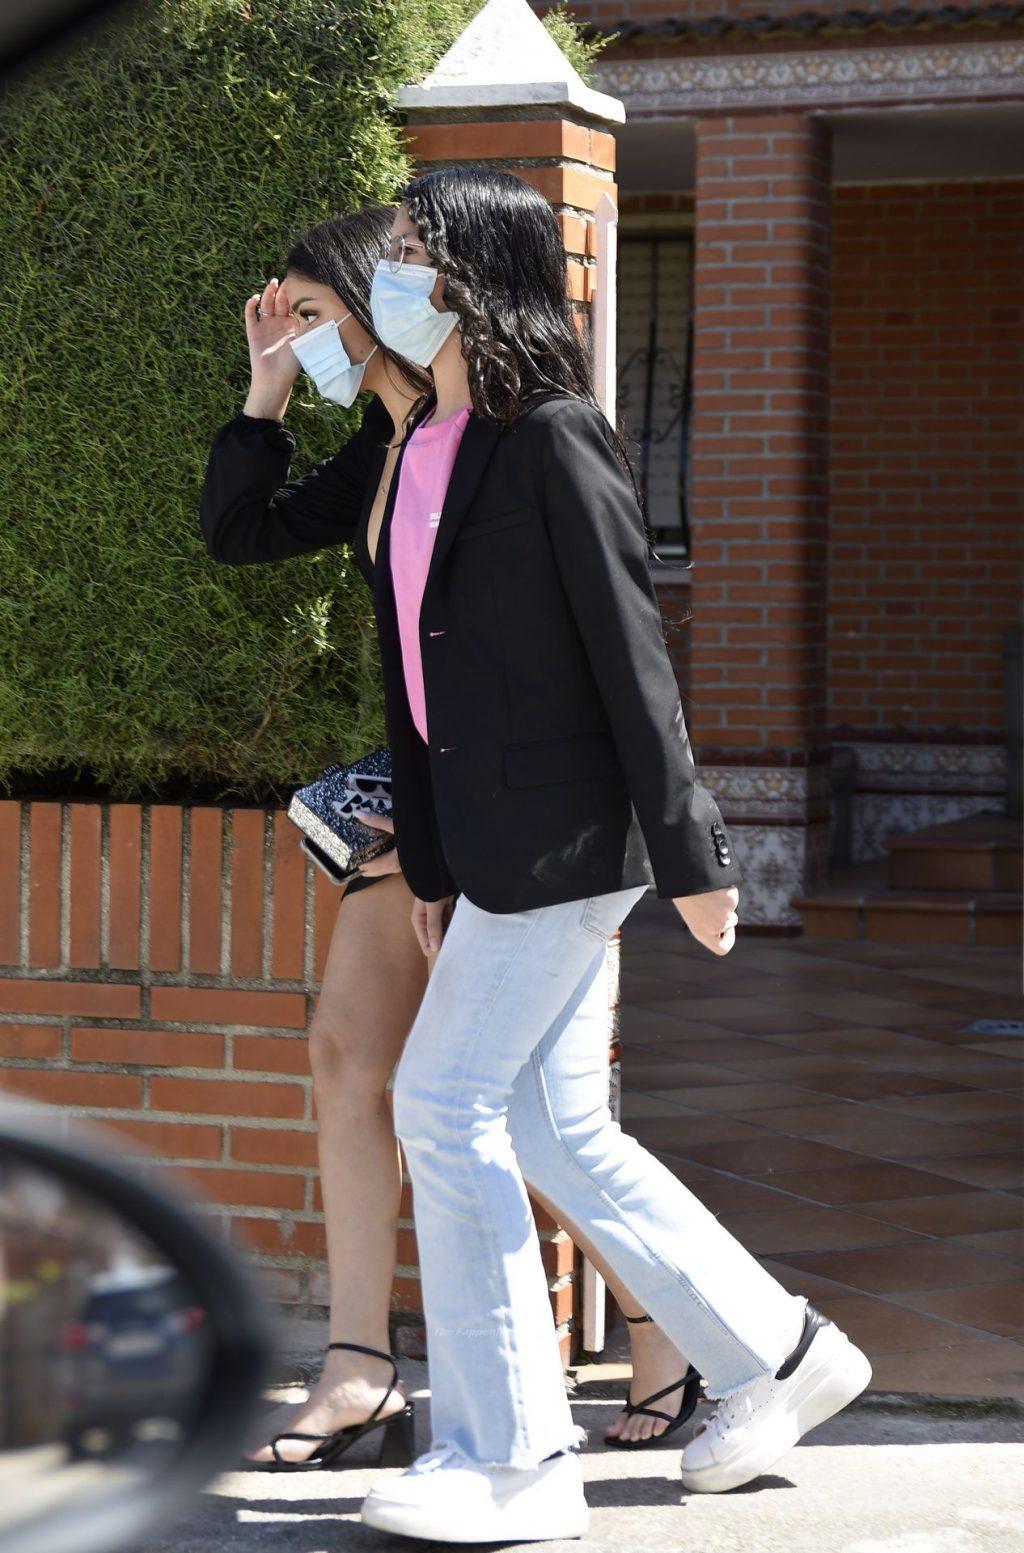 Leggy Julia Janeiro Campanario Celebrates Her 18th Birthday in Madrid (14 Photos)